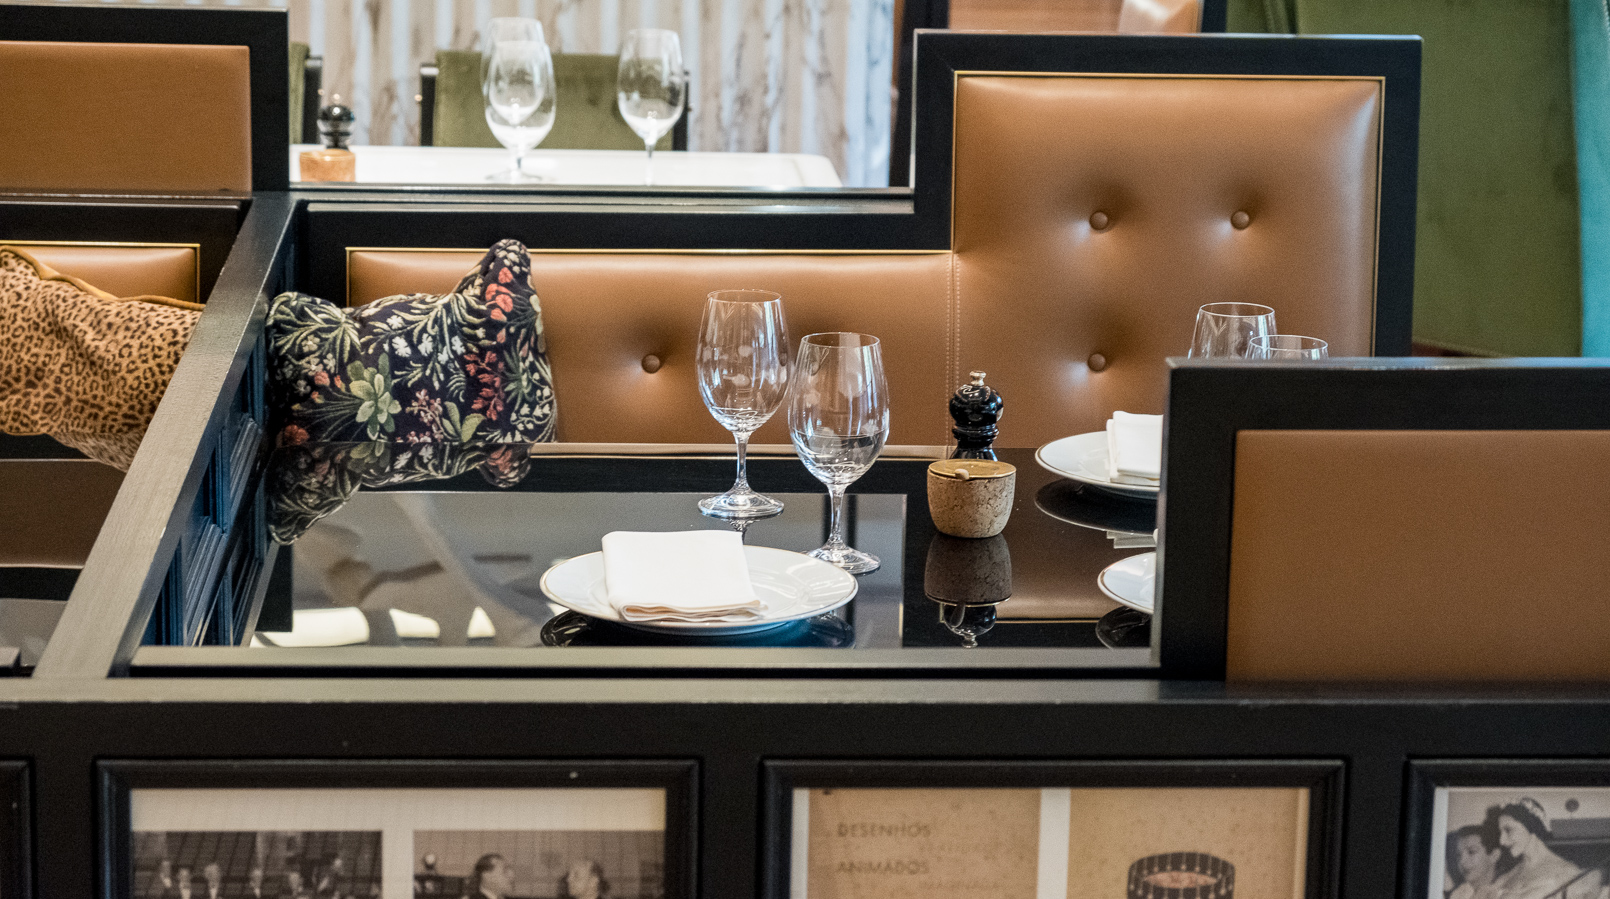 Le Fashionaire Restaurante preferido em Lisboa: JNcQUOI restaurante jncquoi lisboa mesa sofas castanhos 5720F PT